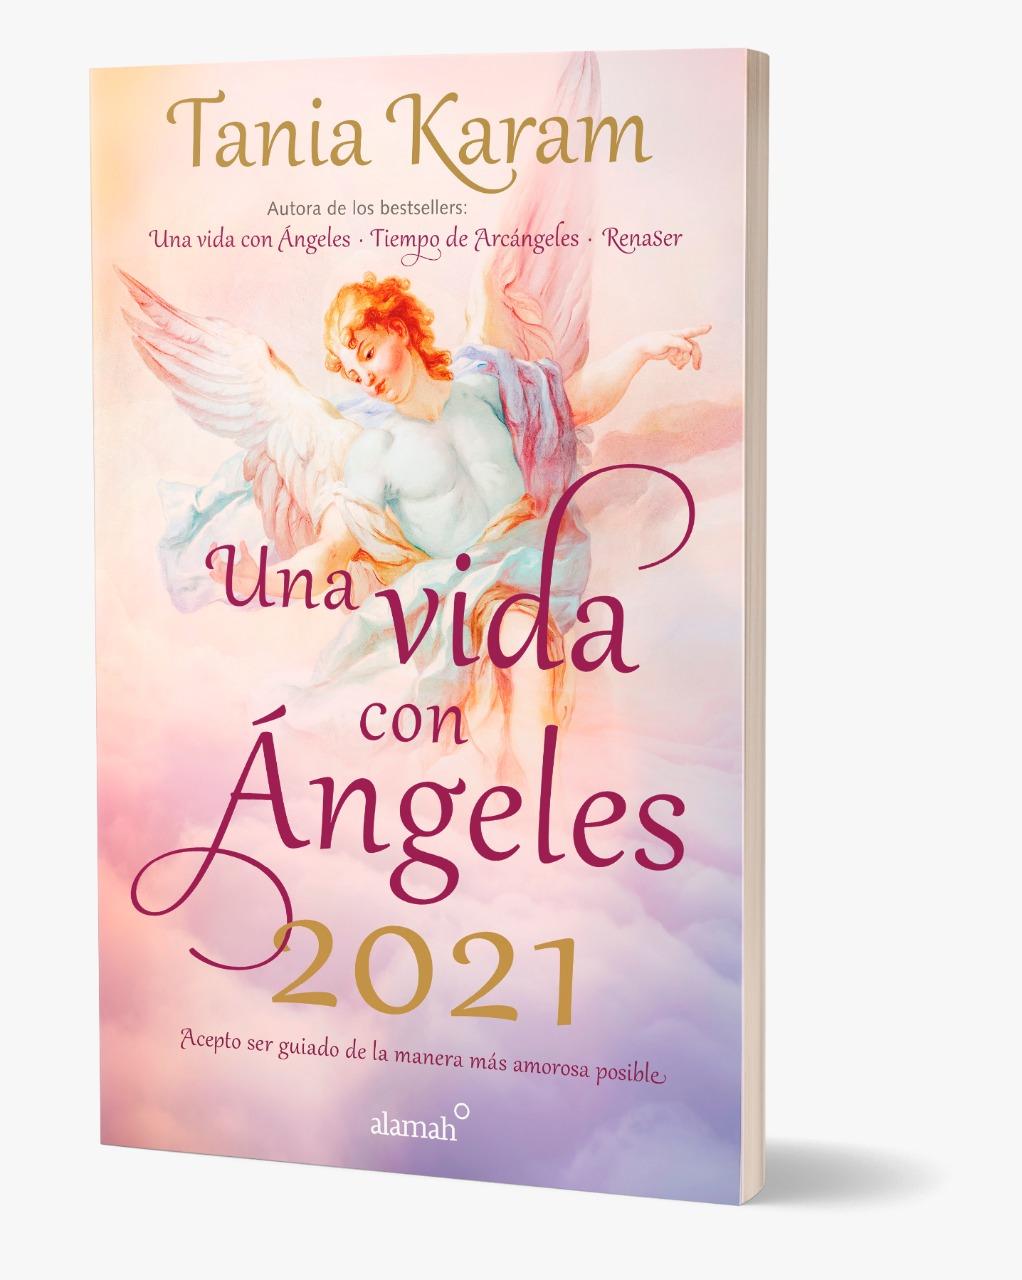 agenda Tania Karam 2021